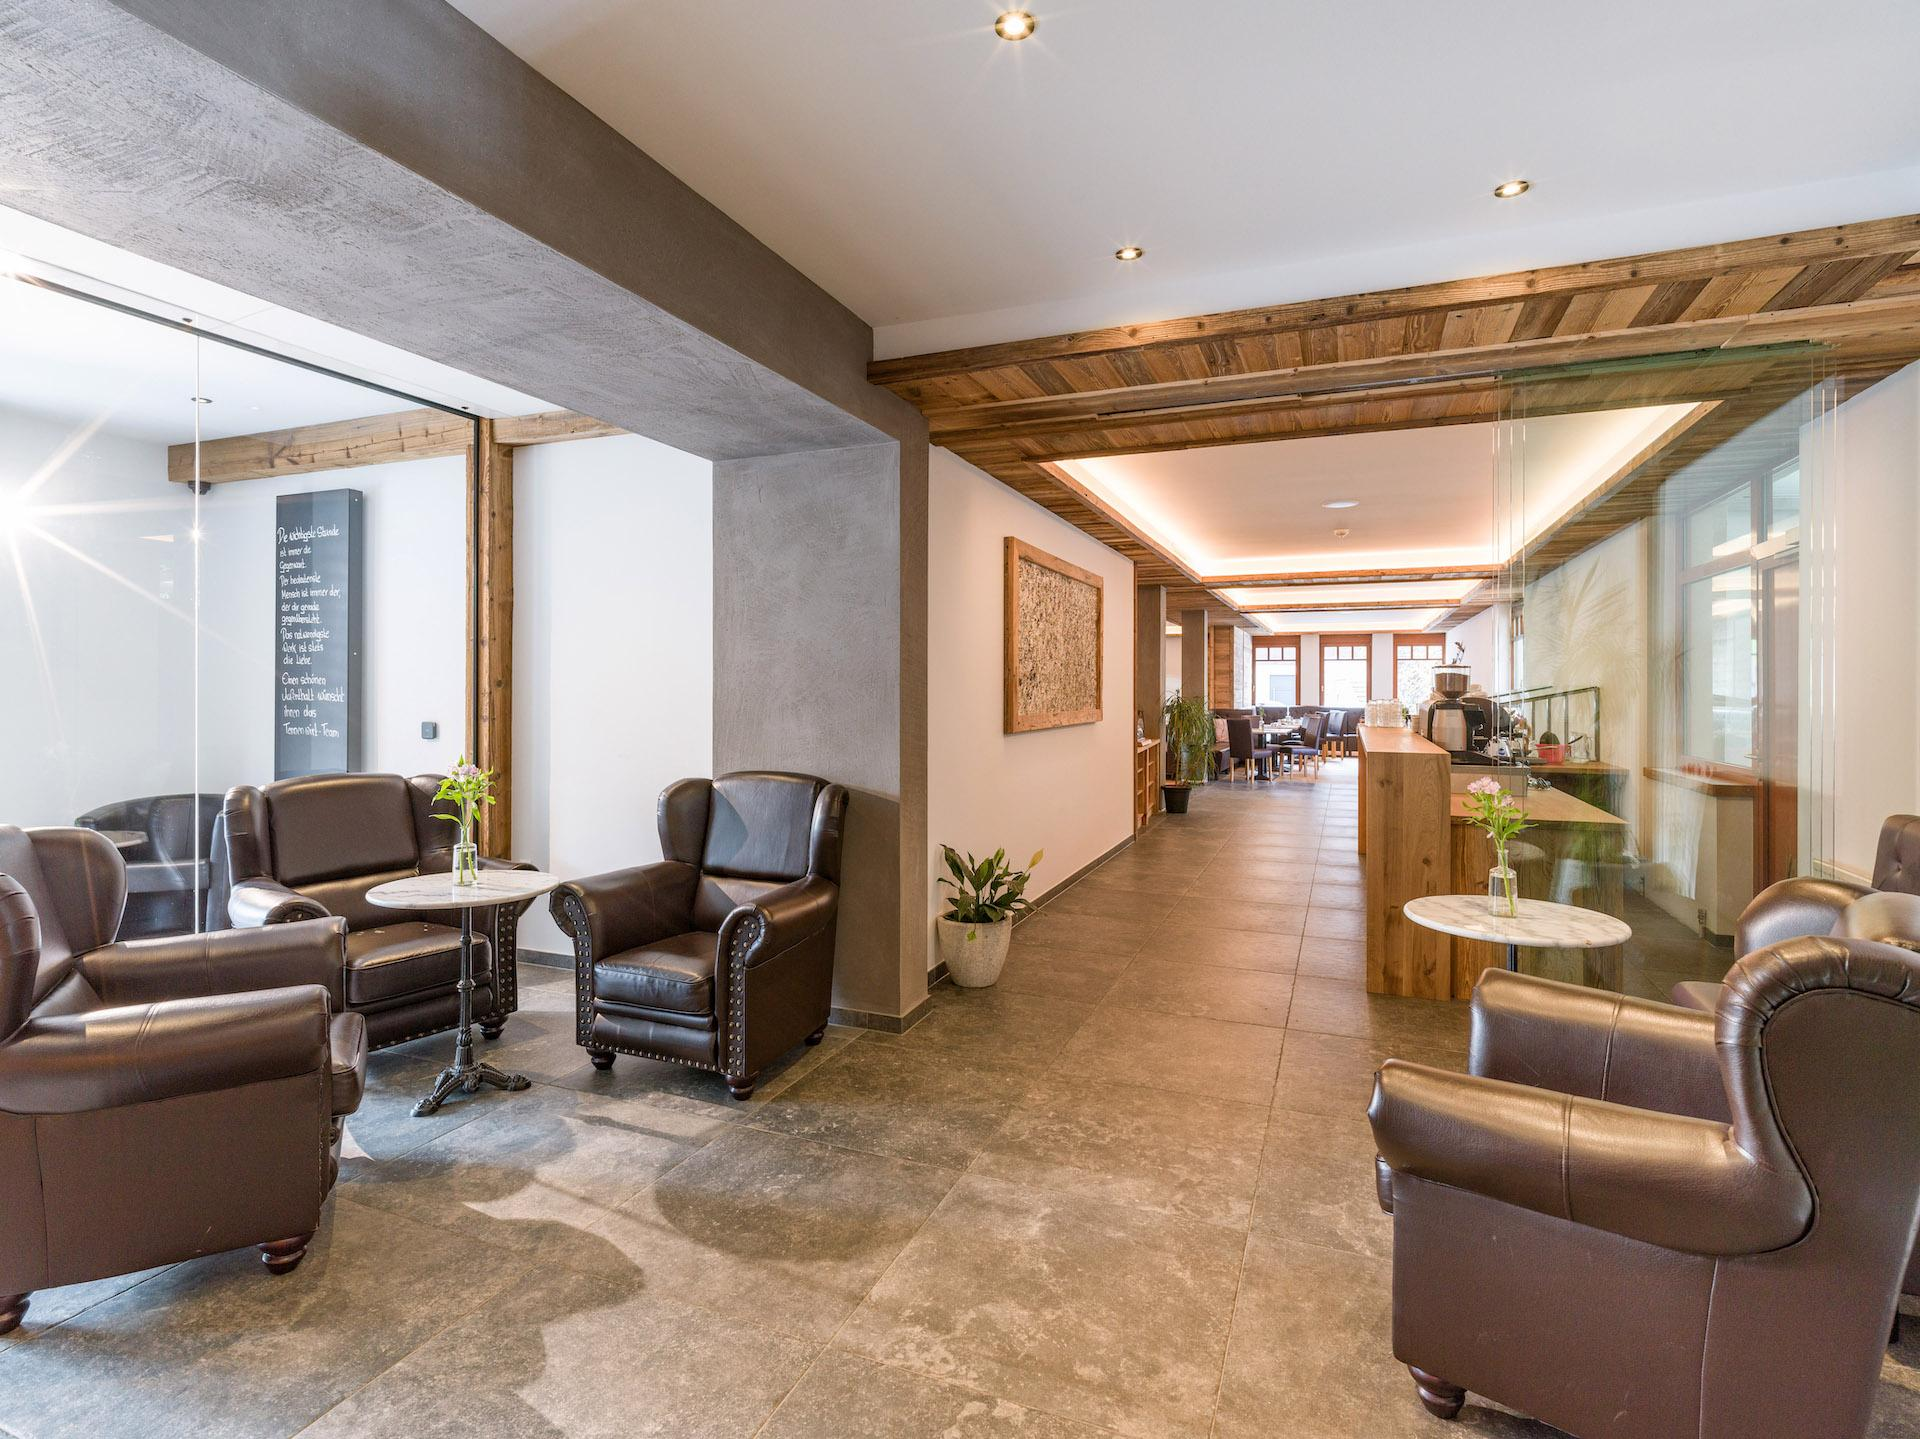 Tennenwirt Guesthouse #Willkommen#Hotel#Guesthouse#Bildergalerie